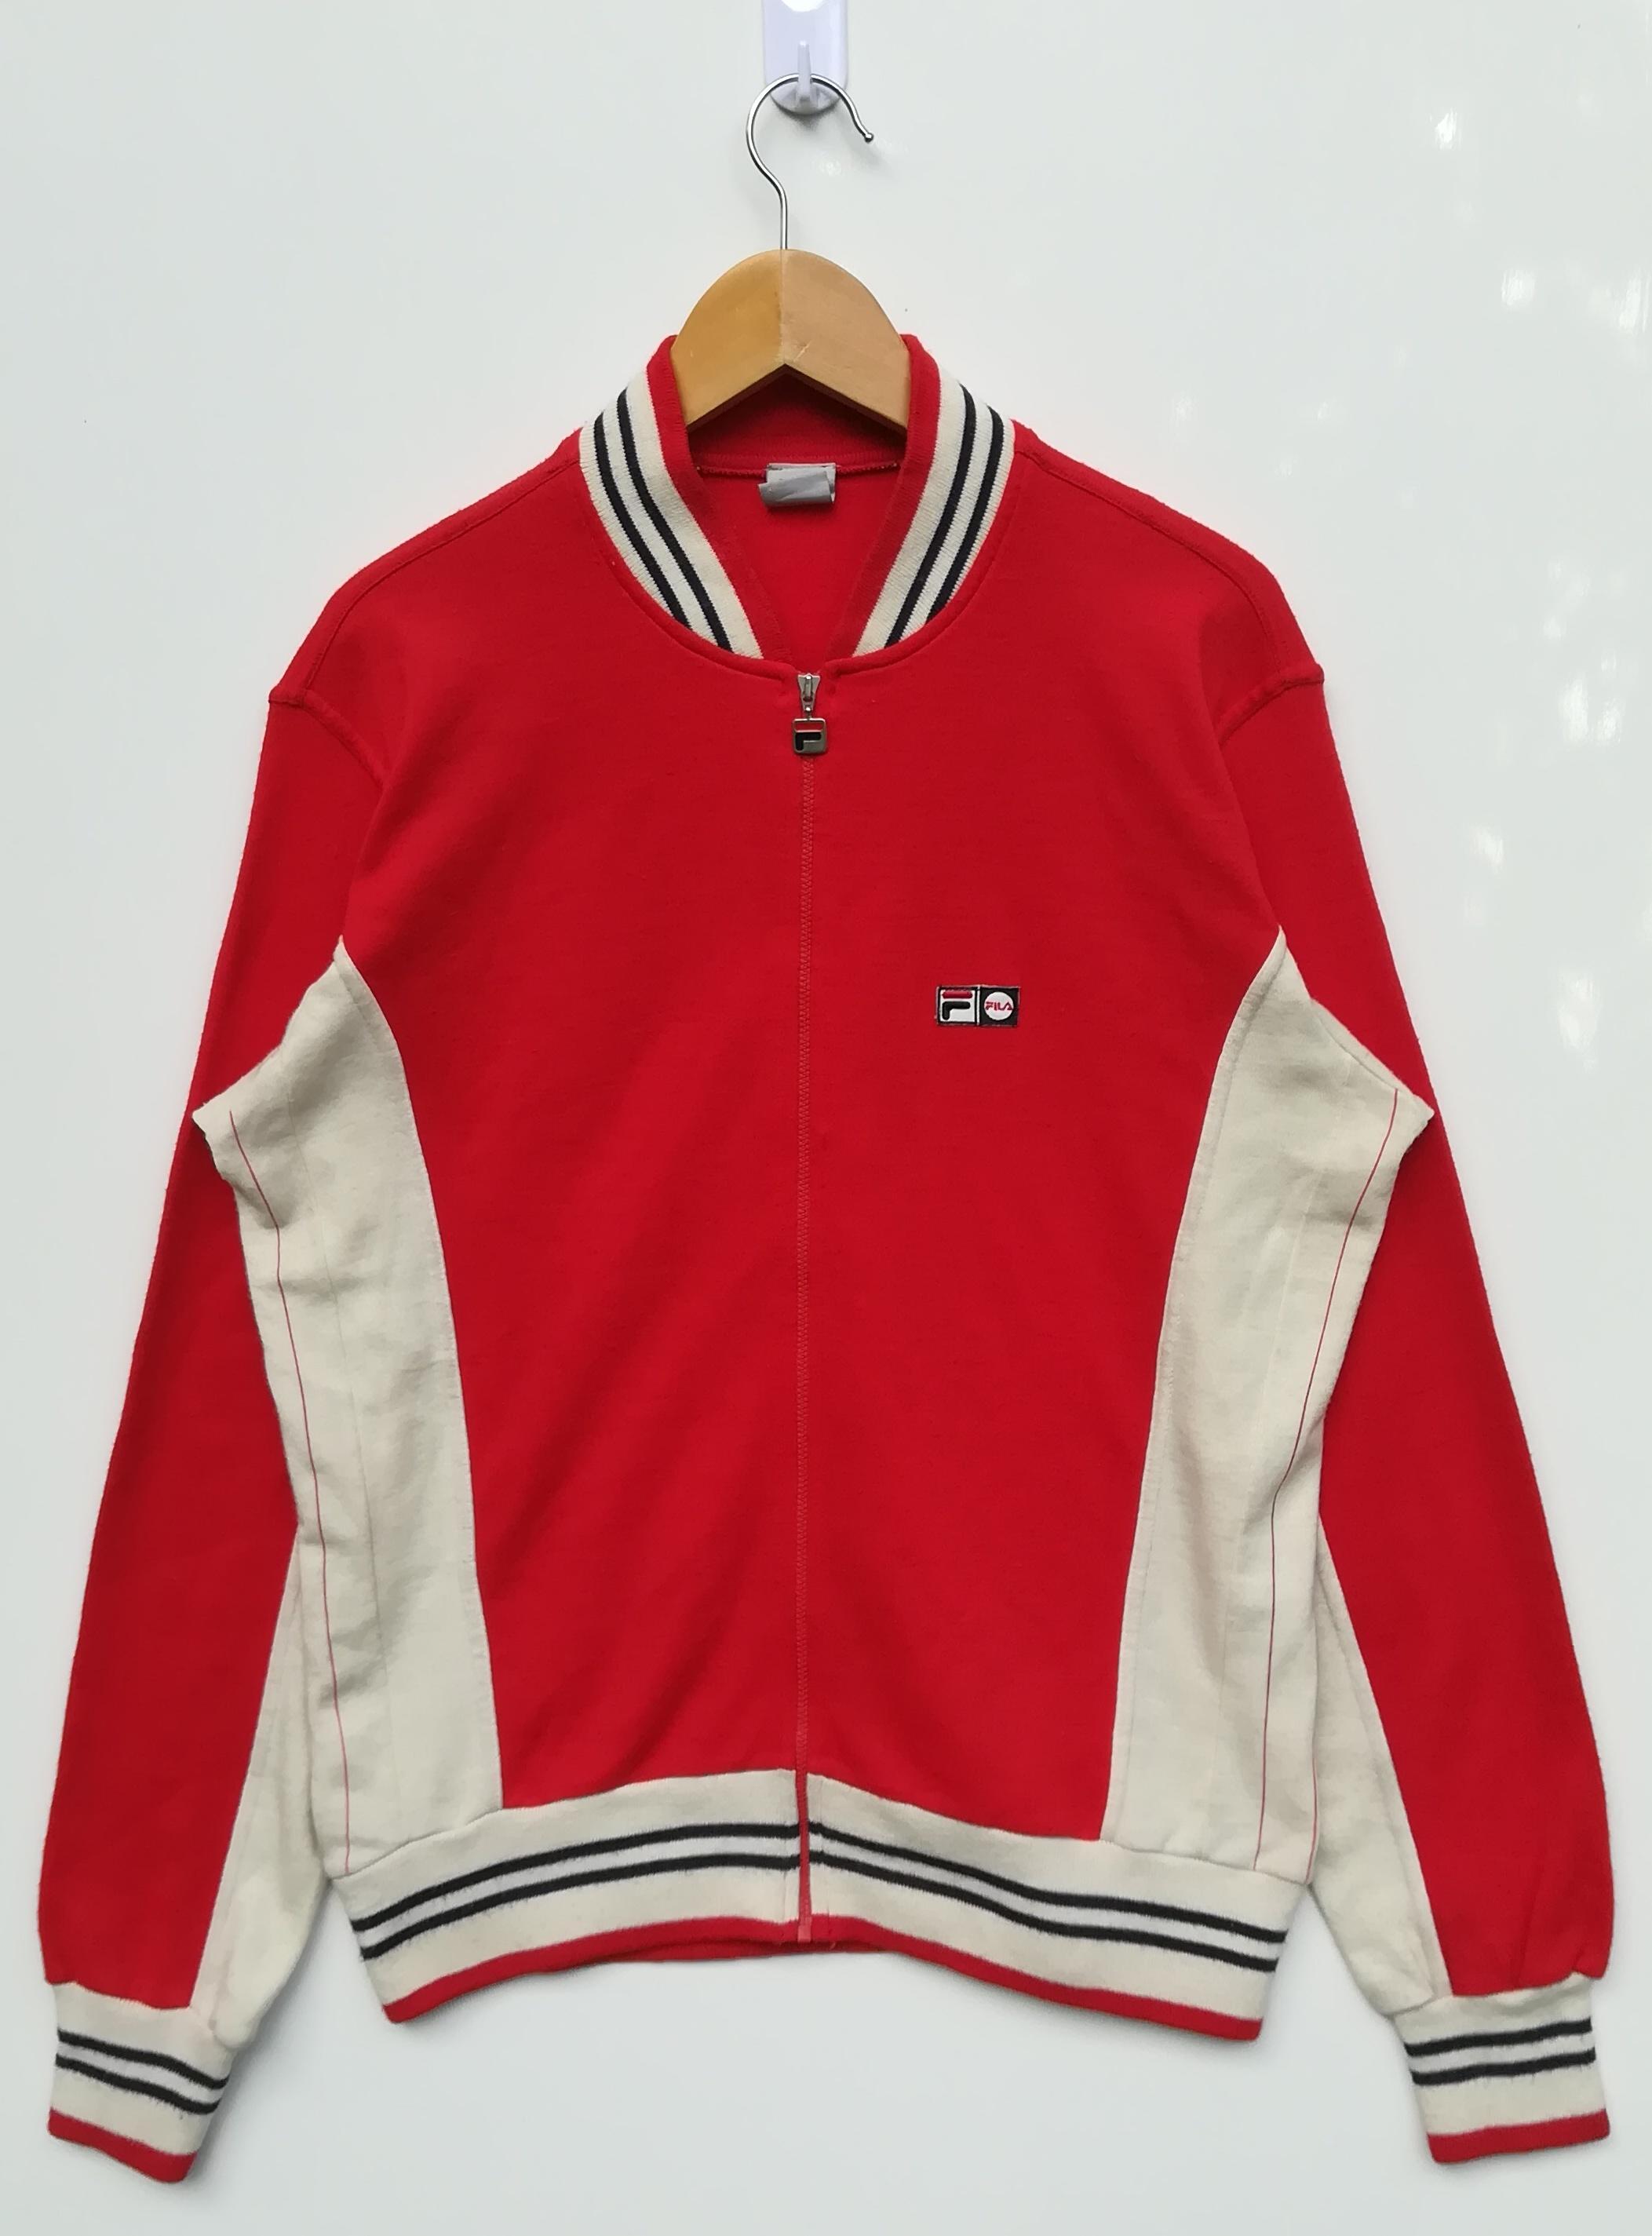 Vintage Fila Track Top Jacket